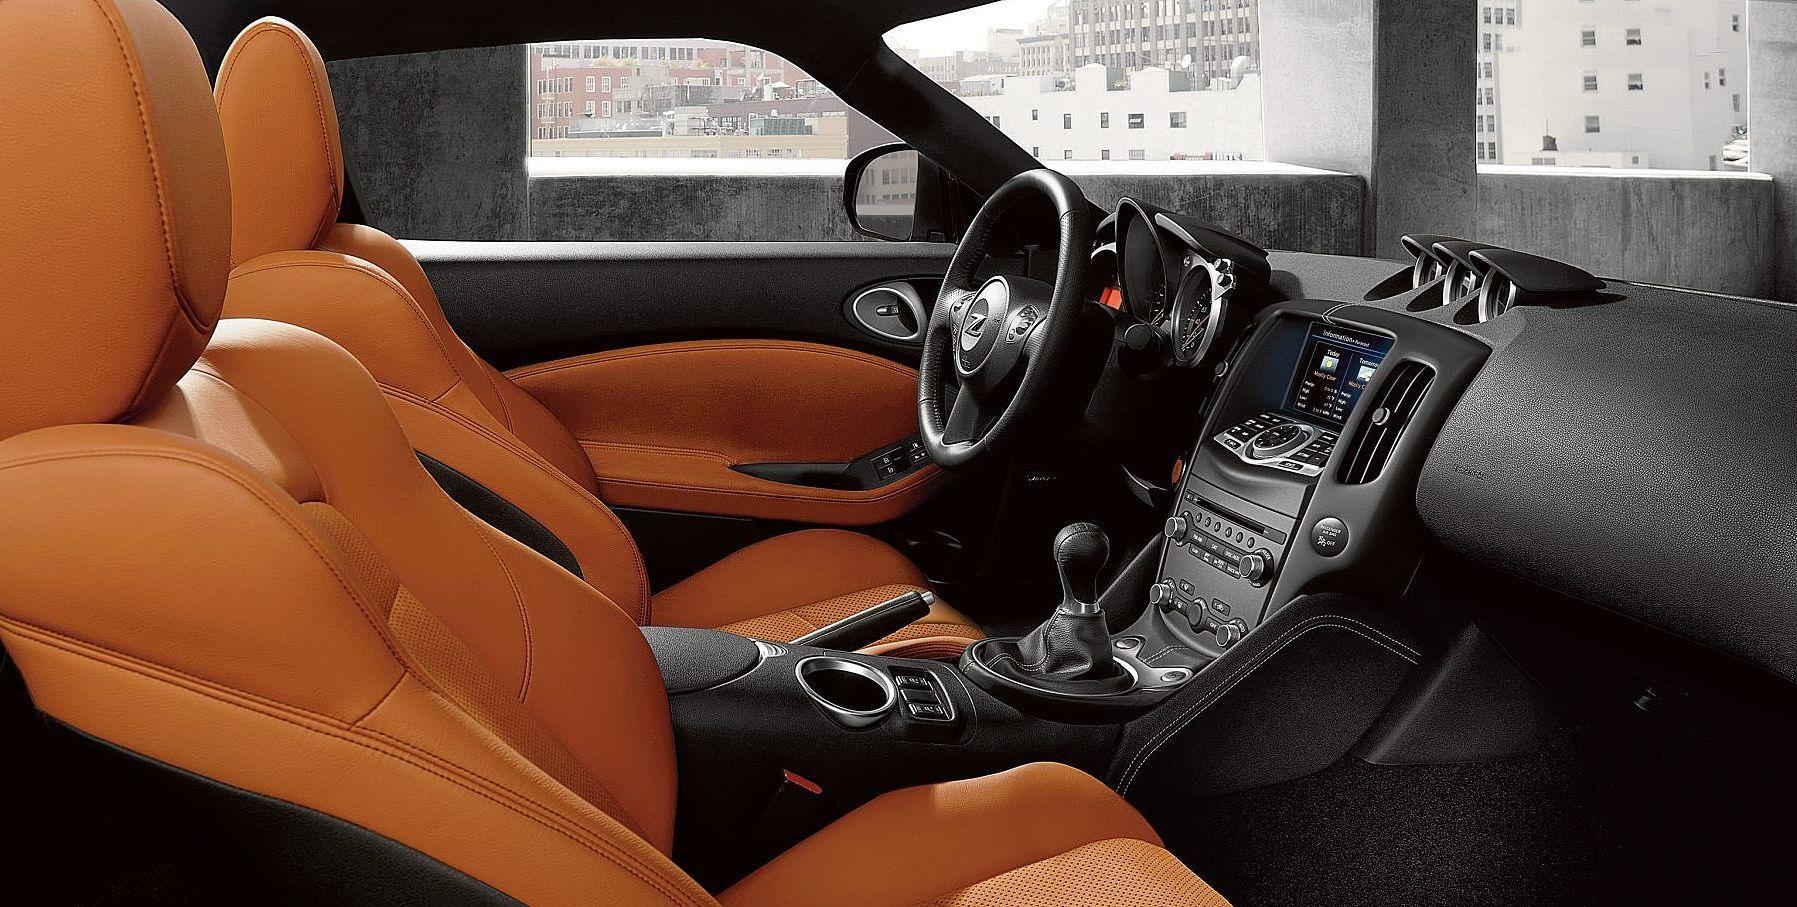 nissan 370z coupe sportwagen v6 auto emotion gmbh co kg offenbach. Black Bedroom Furniture Sets. Home Design Ideas